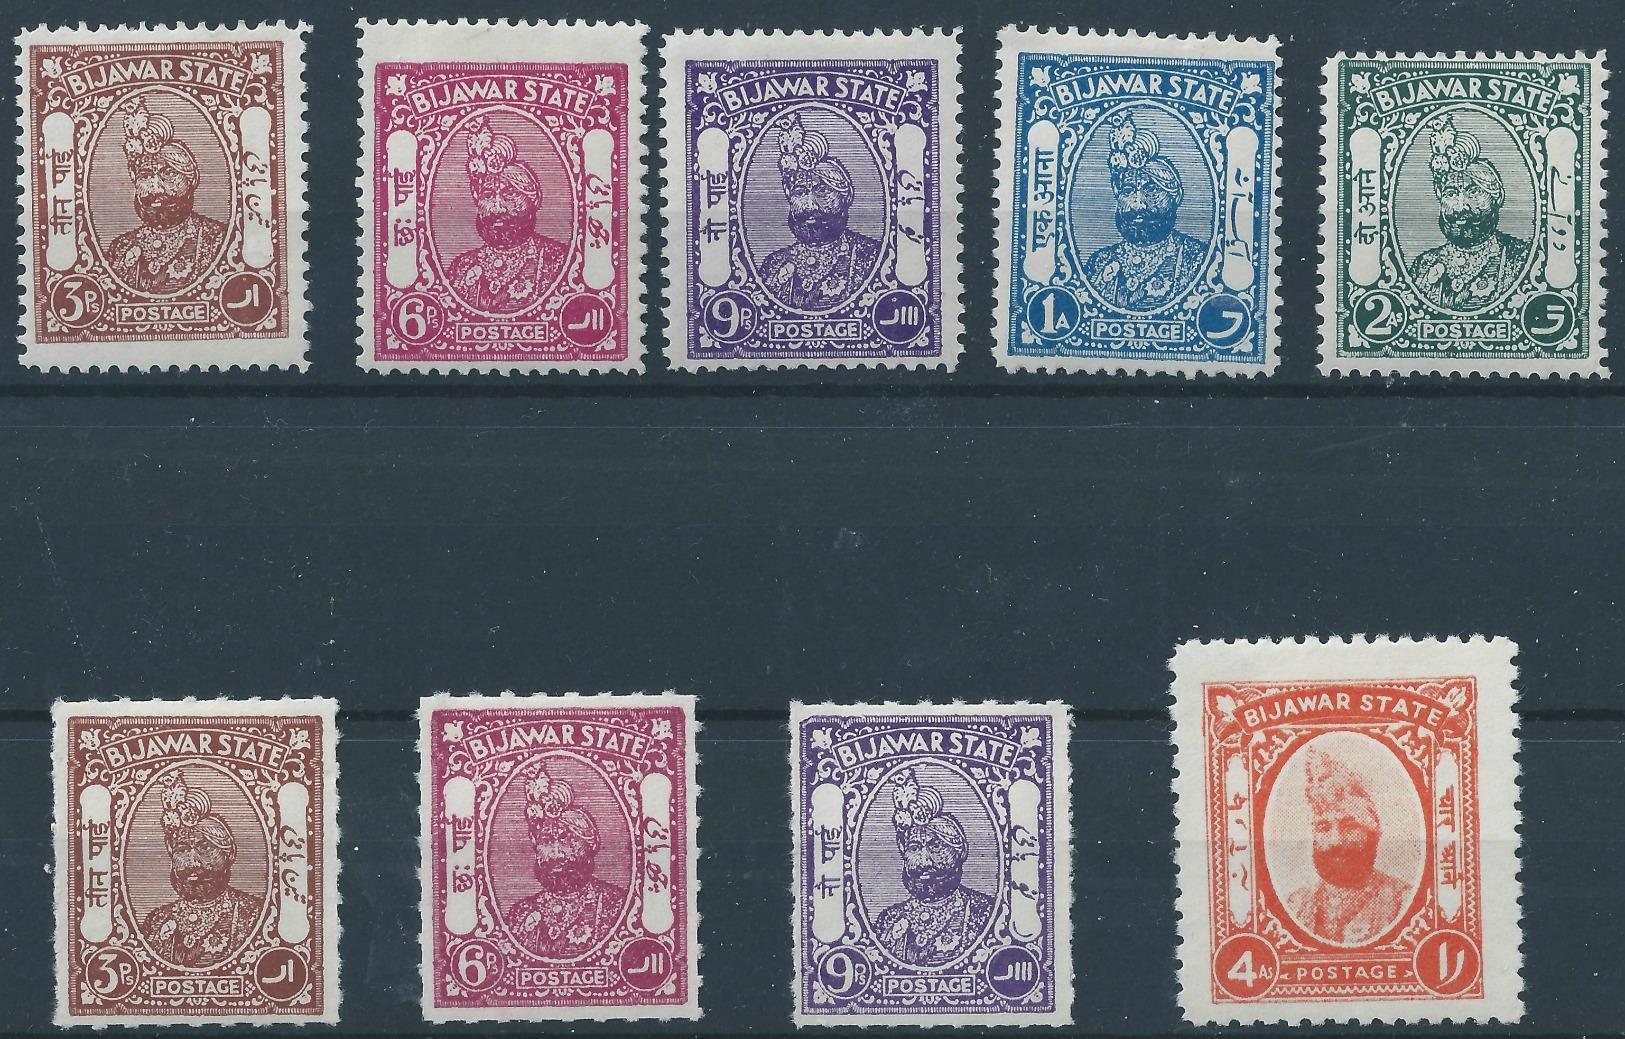 India Bijawar State Selection Of 9 Stamps Mint Hinged - Bijawar